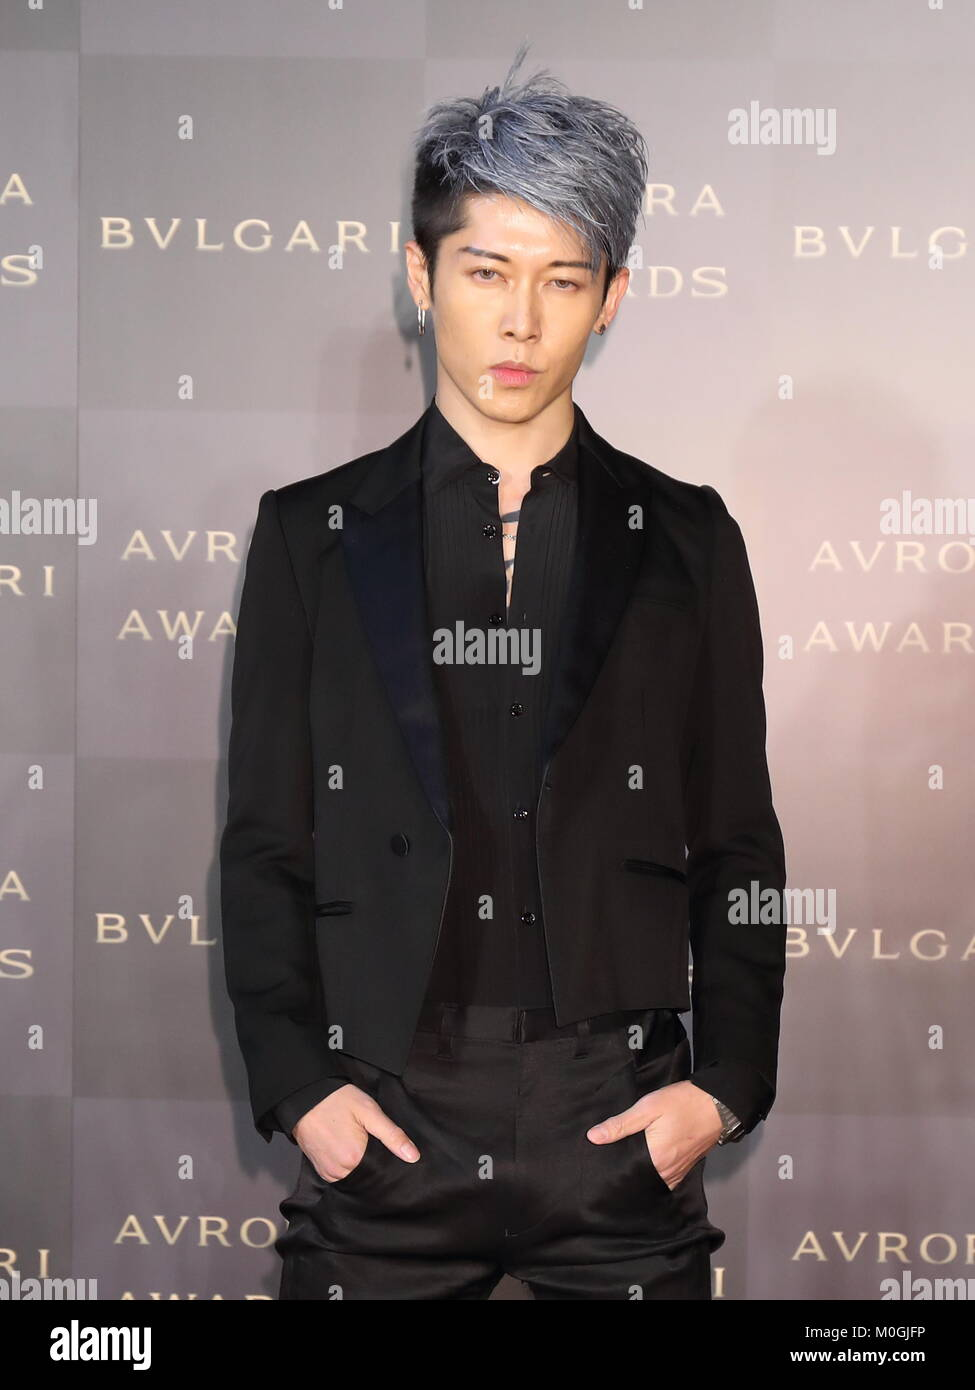 8de1ea25c54 Japanese musician Miyavi attends Bvlgari Avrora Awards in Tokyo ...